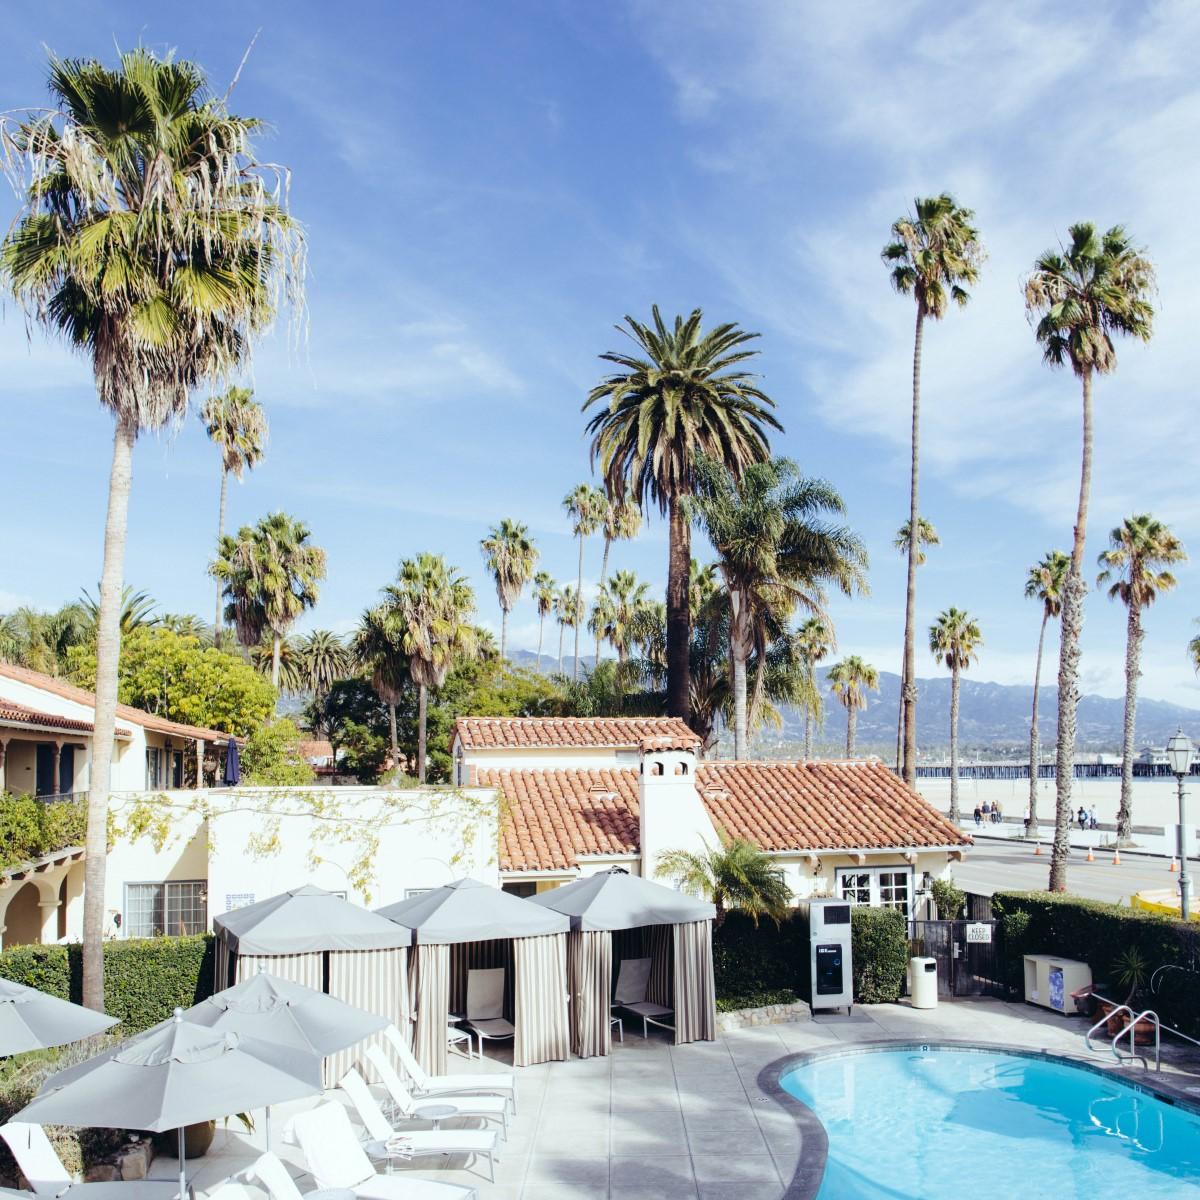 HOTEL MILO  / Santa Barbara, California